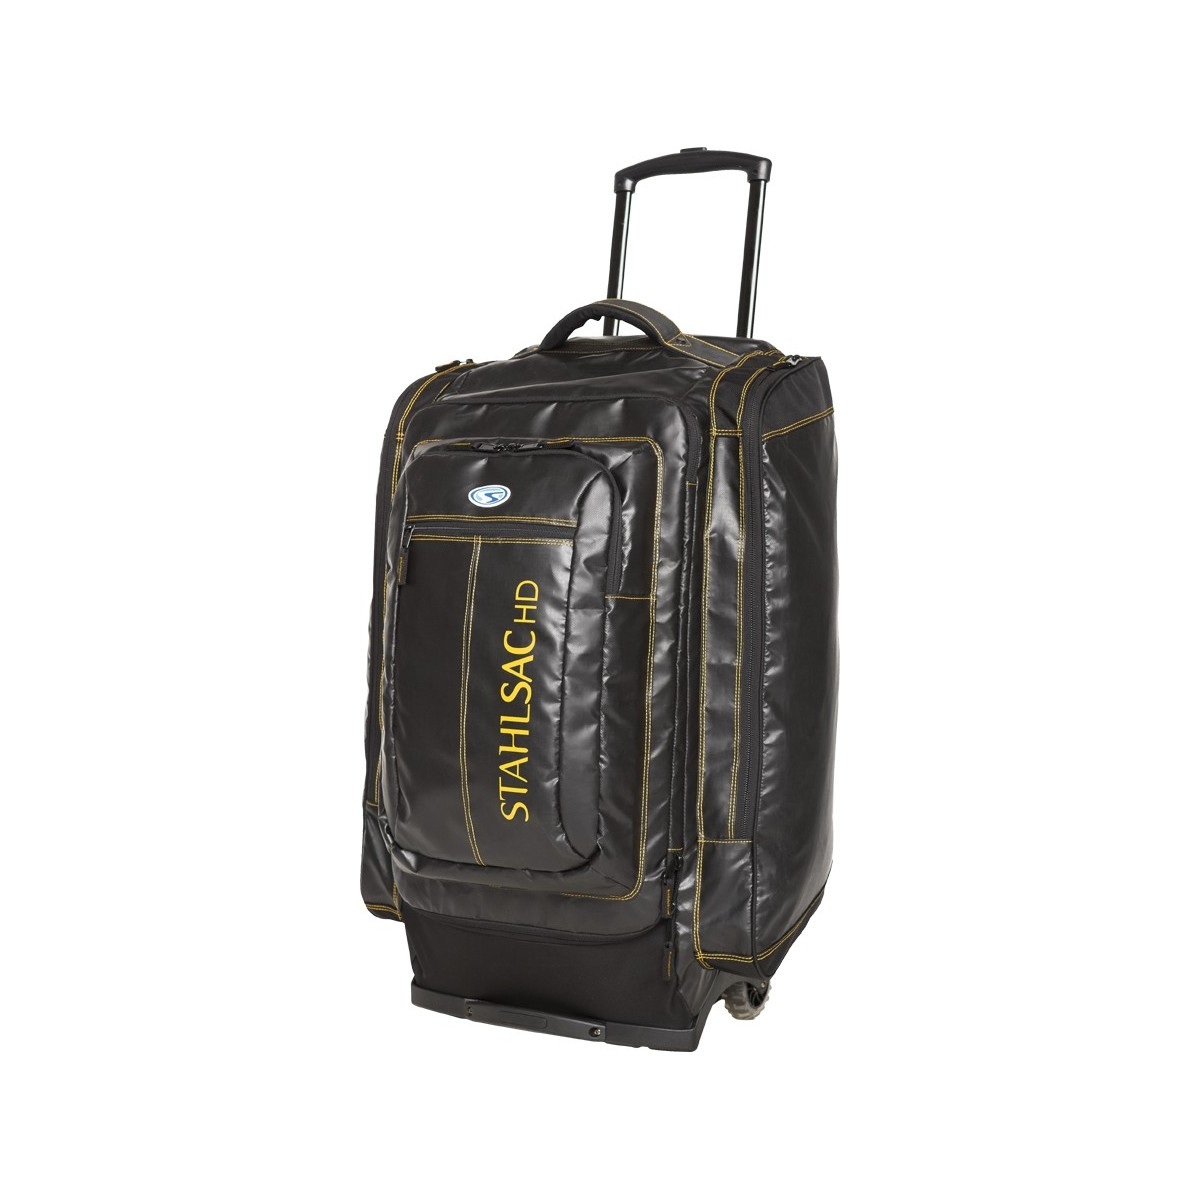 Stahlsac HD Caicos Cargo Pack Travel Bag